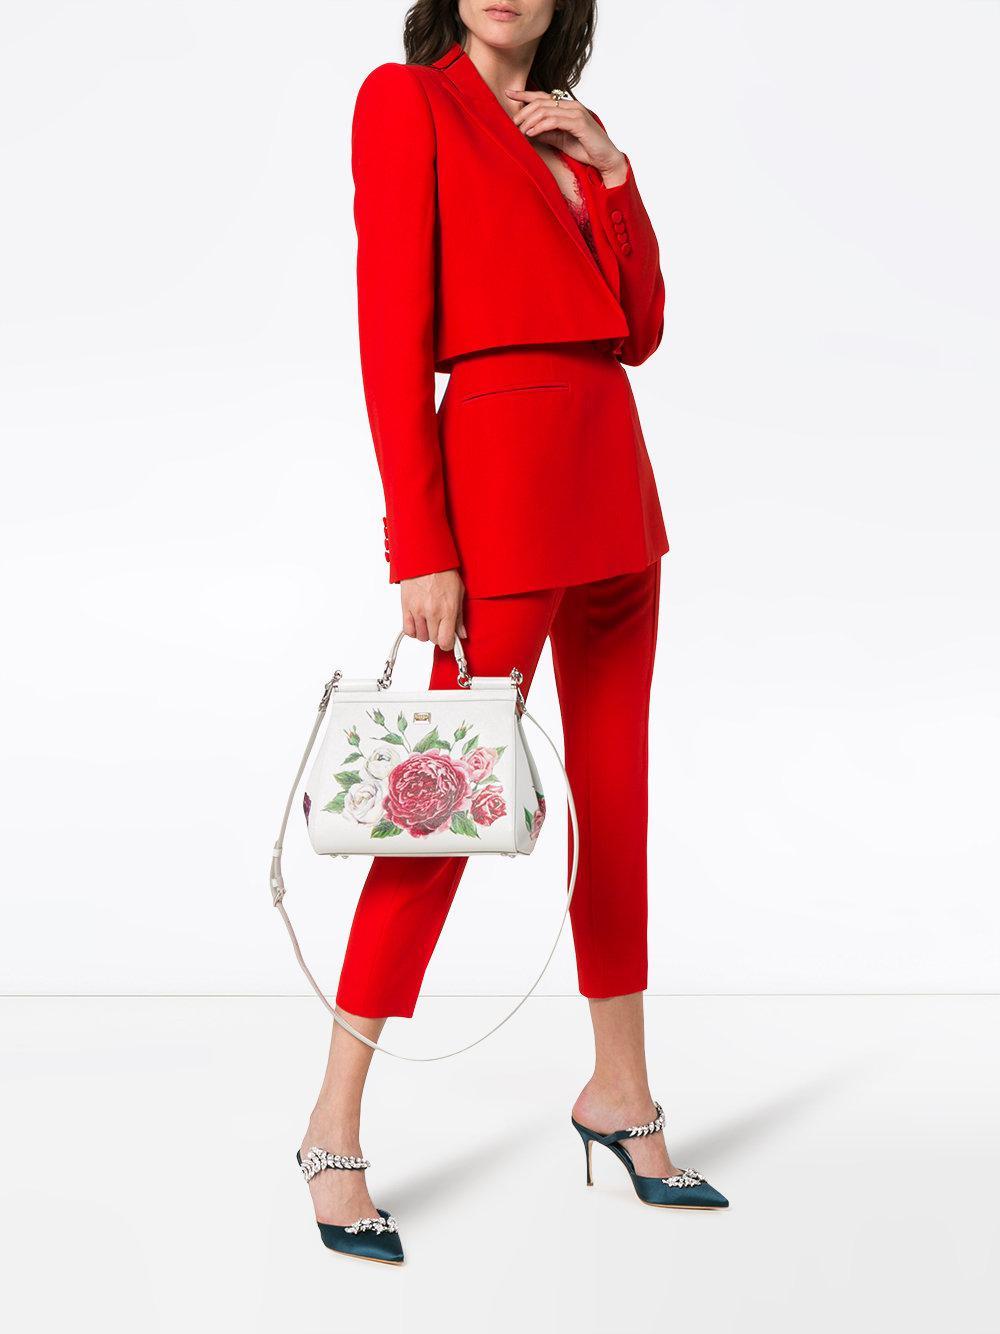 9b50394ffbe6 Dolce And Green View Handbag Fullscreen Leather Gabbana White amp  Print  Red Rose Sicily Lyst STaS4r